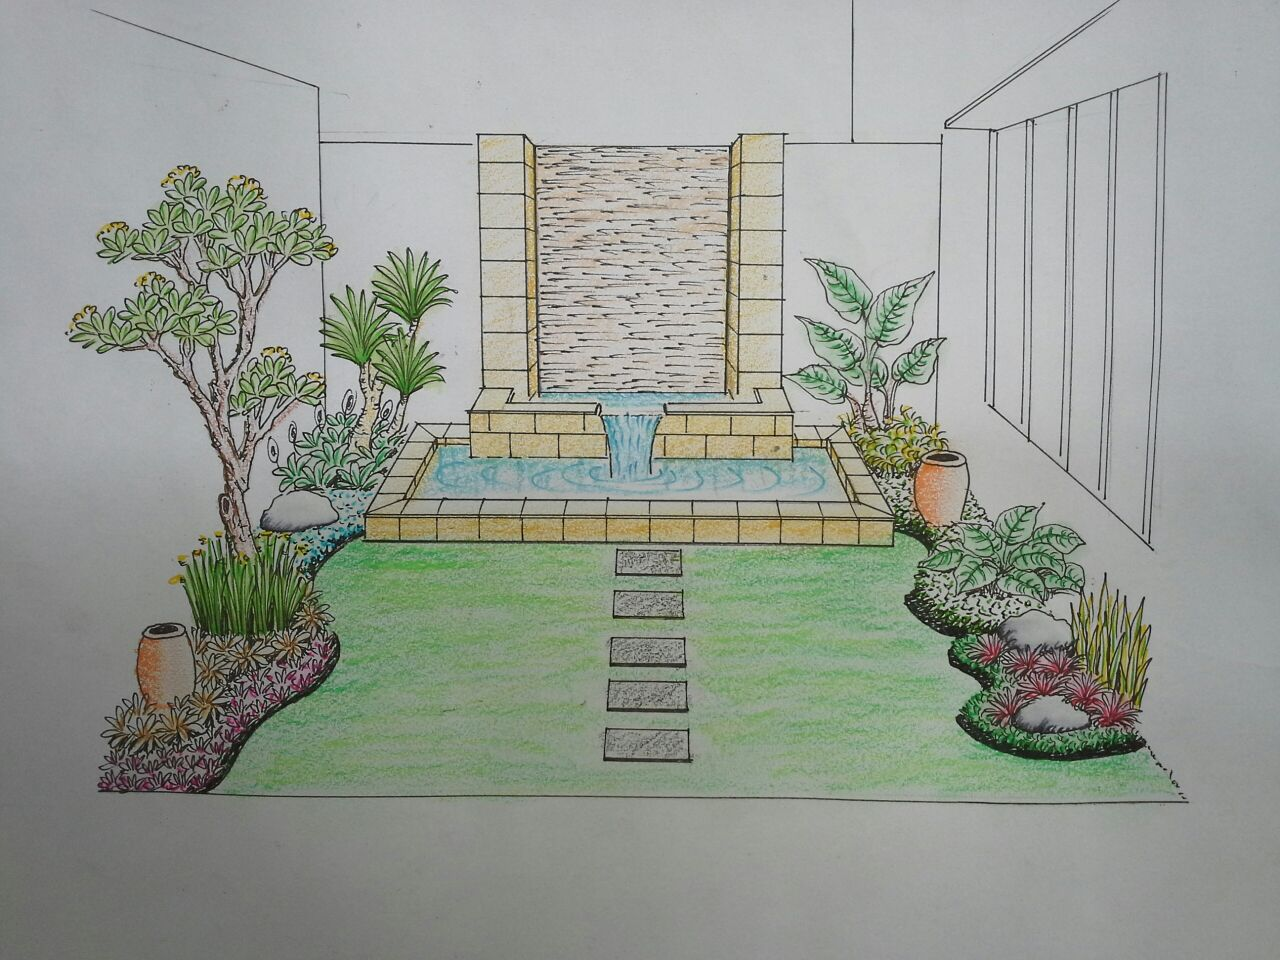 Galeri Sketsa Taman Greengardenasri Green Garden Asri